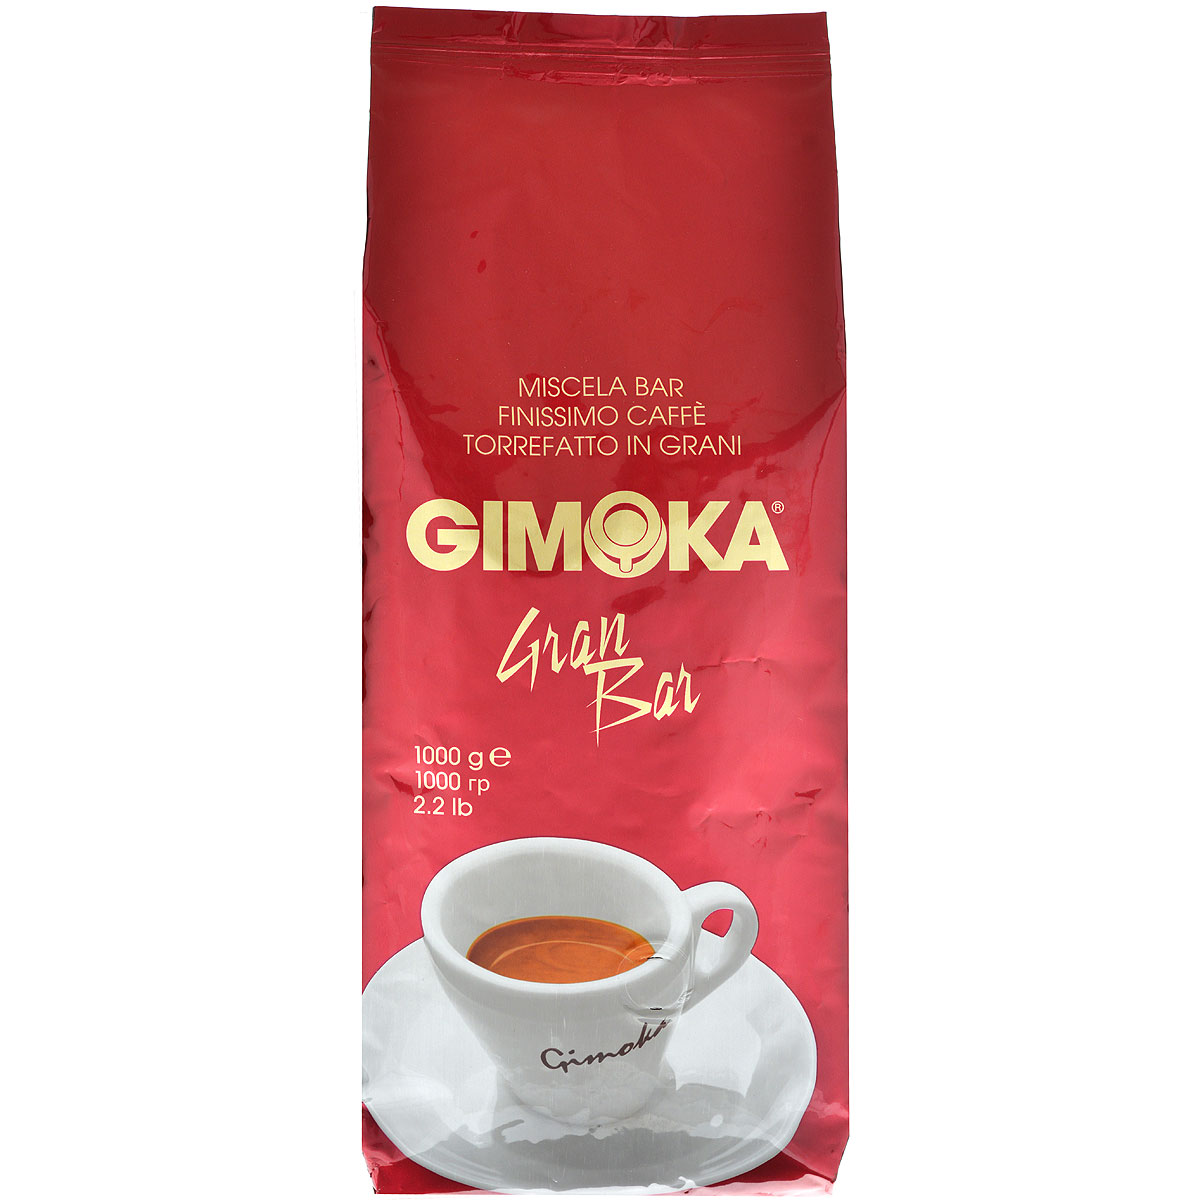 Gimoka Rossa Gran Bar кофе в зернах, 1 кг lavazza grande ristorazione rossa кофе в зернах 1 кг